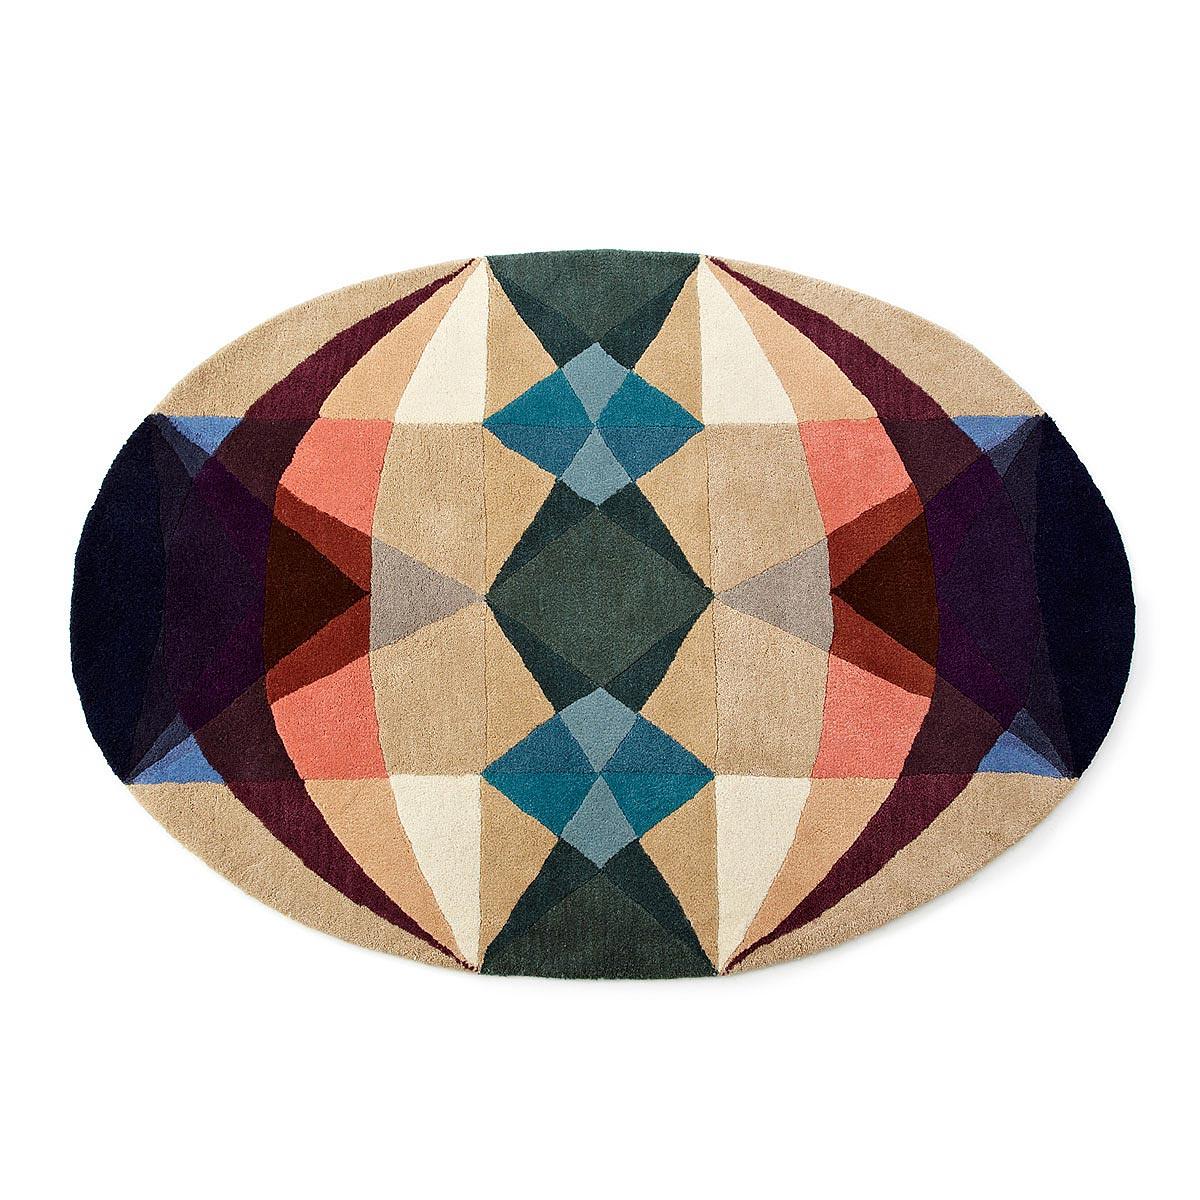 ^ Modern Geometry rea ug Handmade Felted Wool ug, Geometric ...